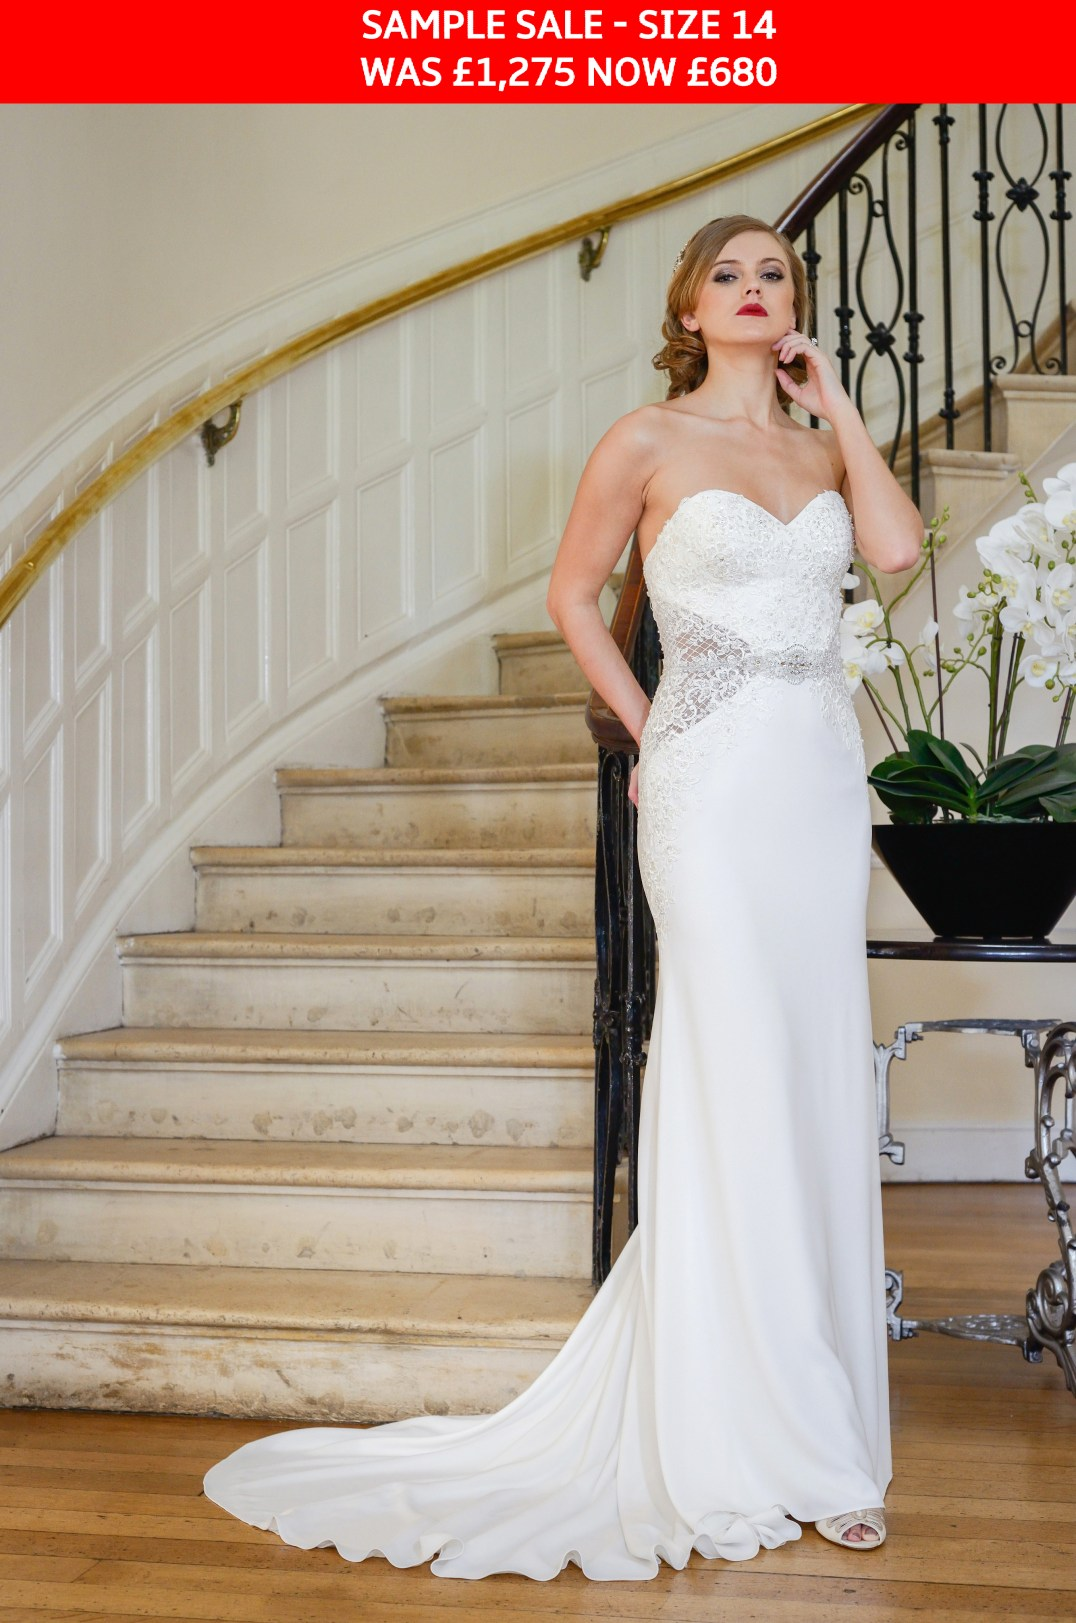 GAIA Nia bridal dress sample sale